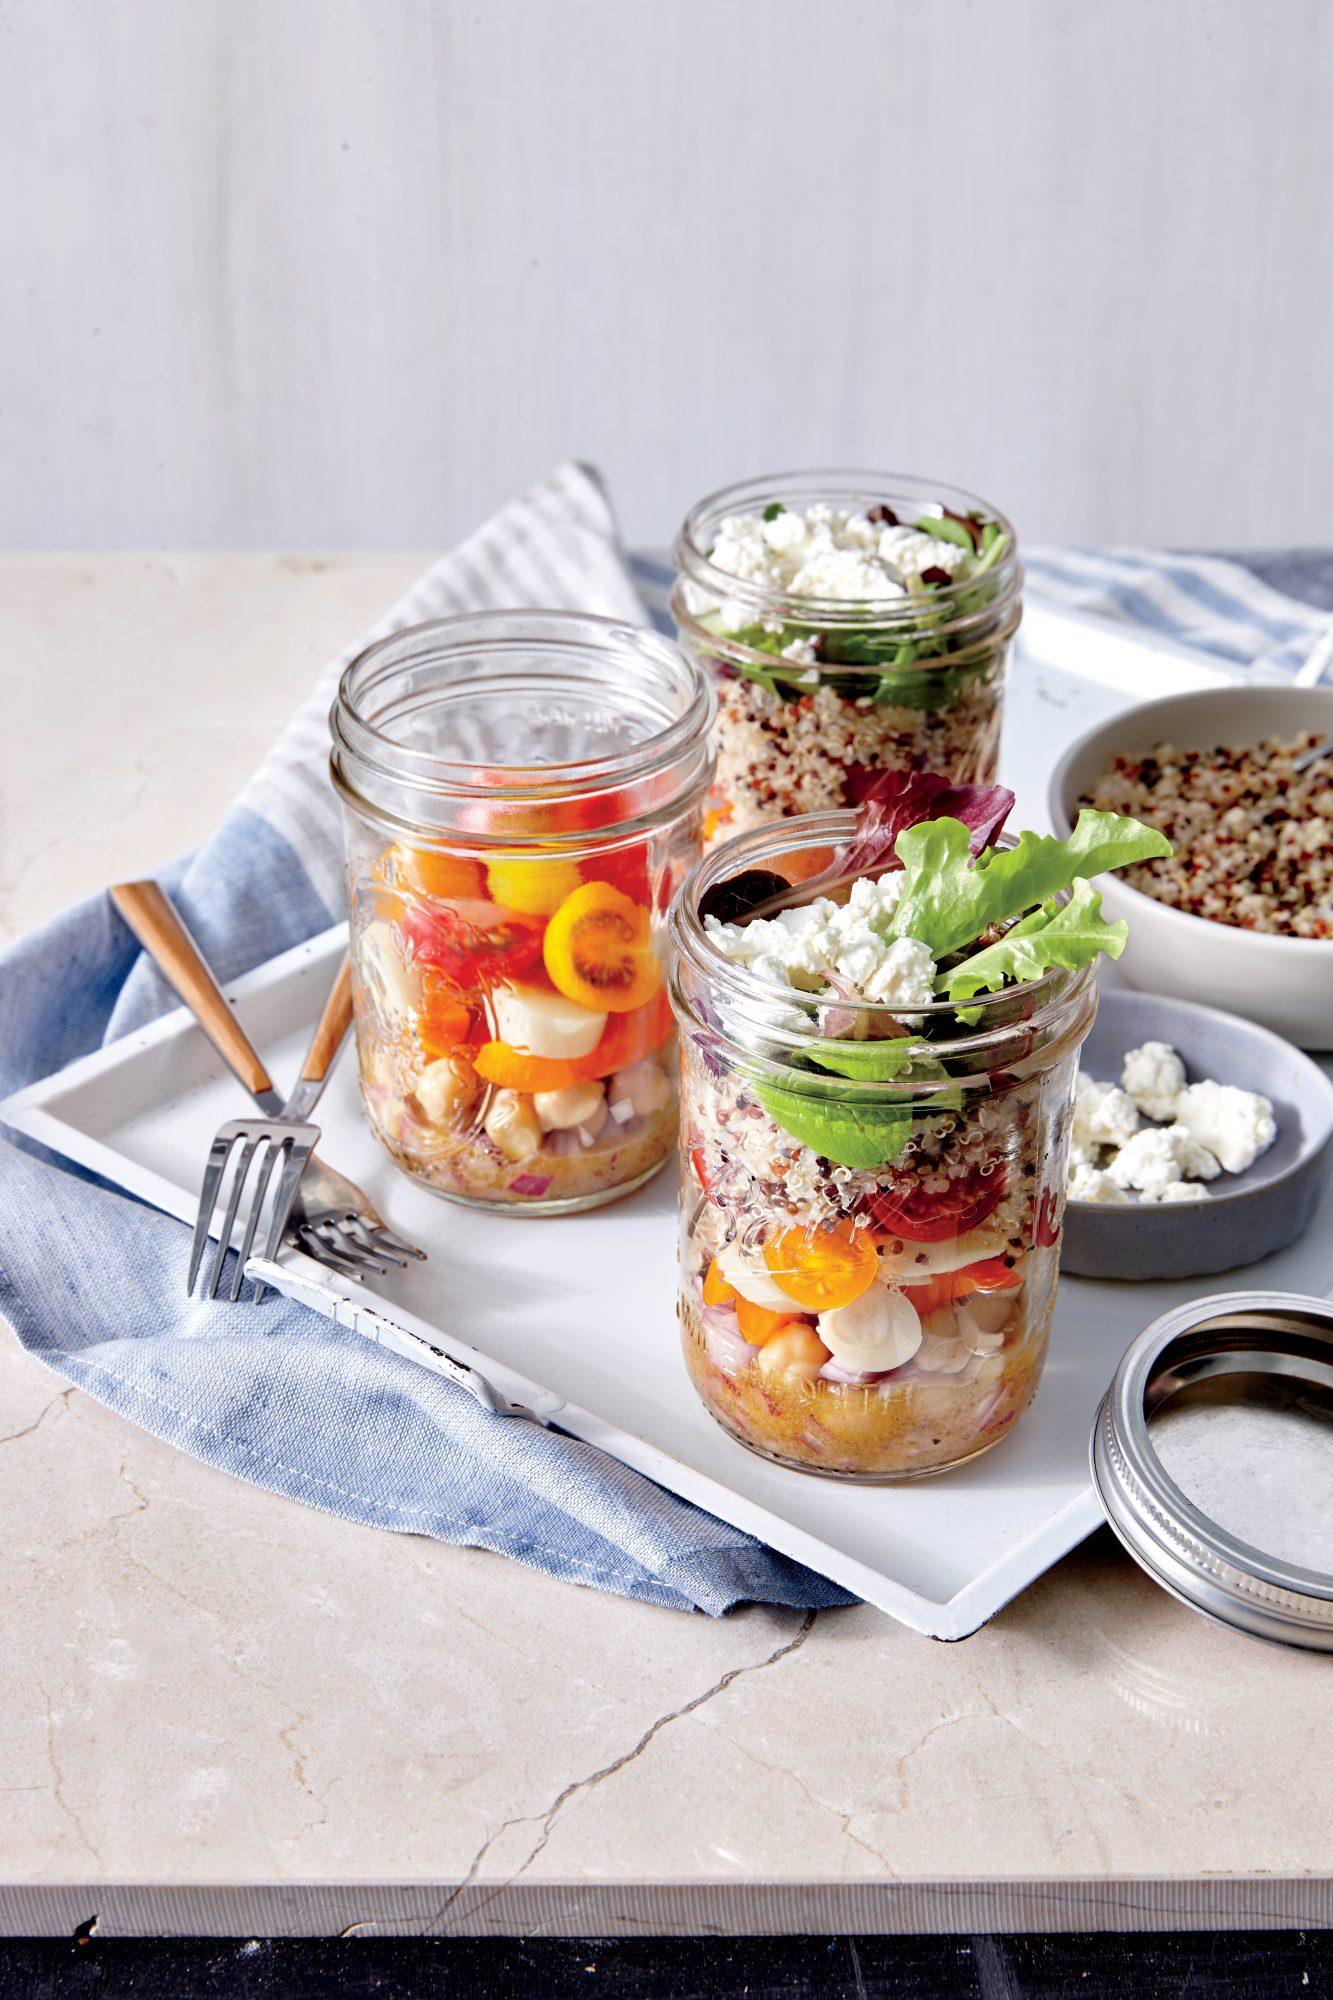 Veggie Salad in a Jar